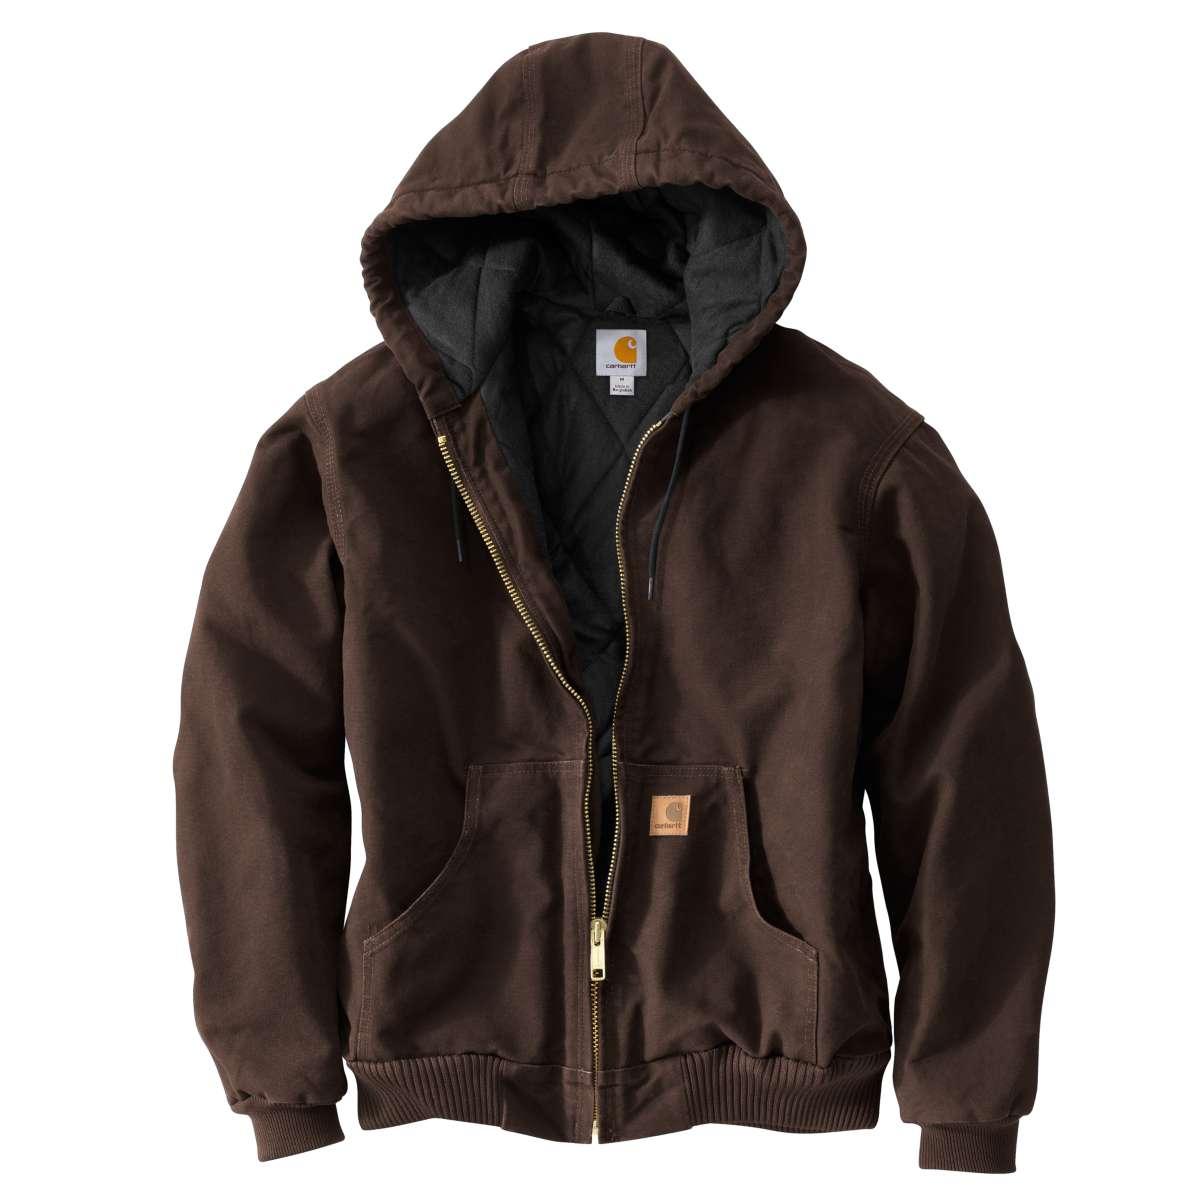 Carhartt Men's Sandstone Duck Jacket, Extended Sizes - Brown, 3XL